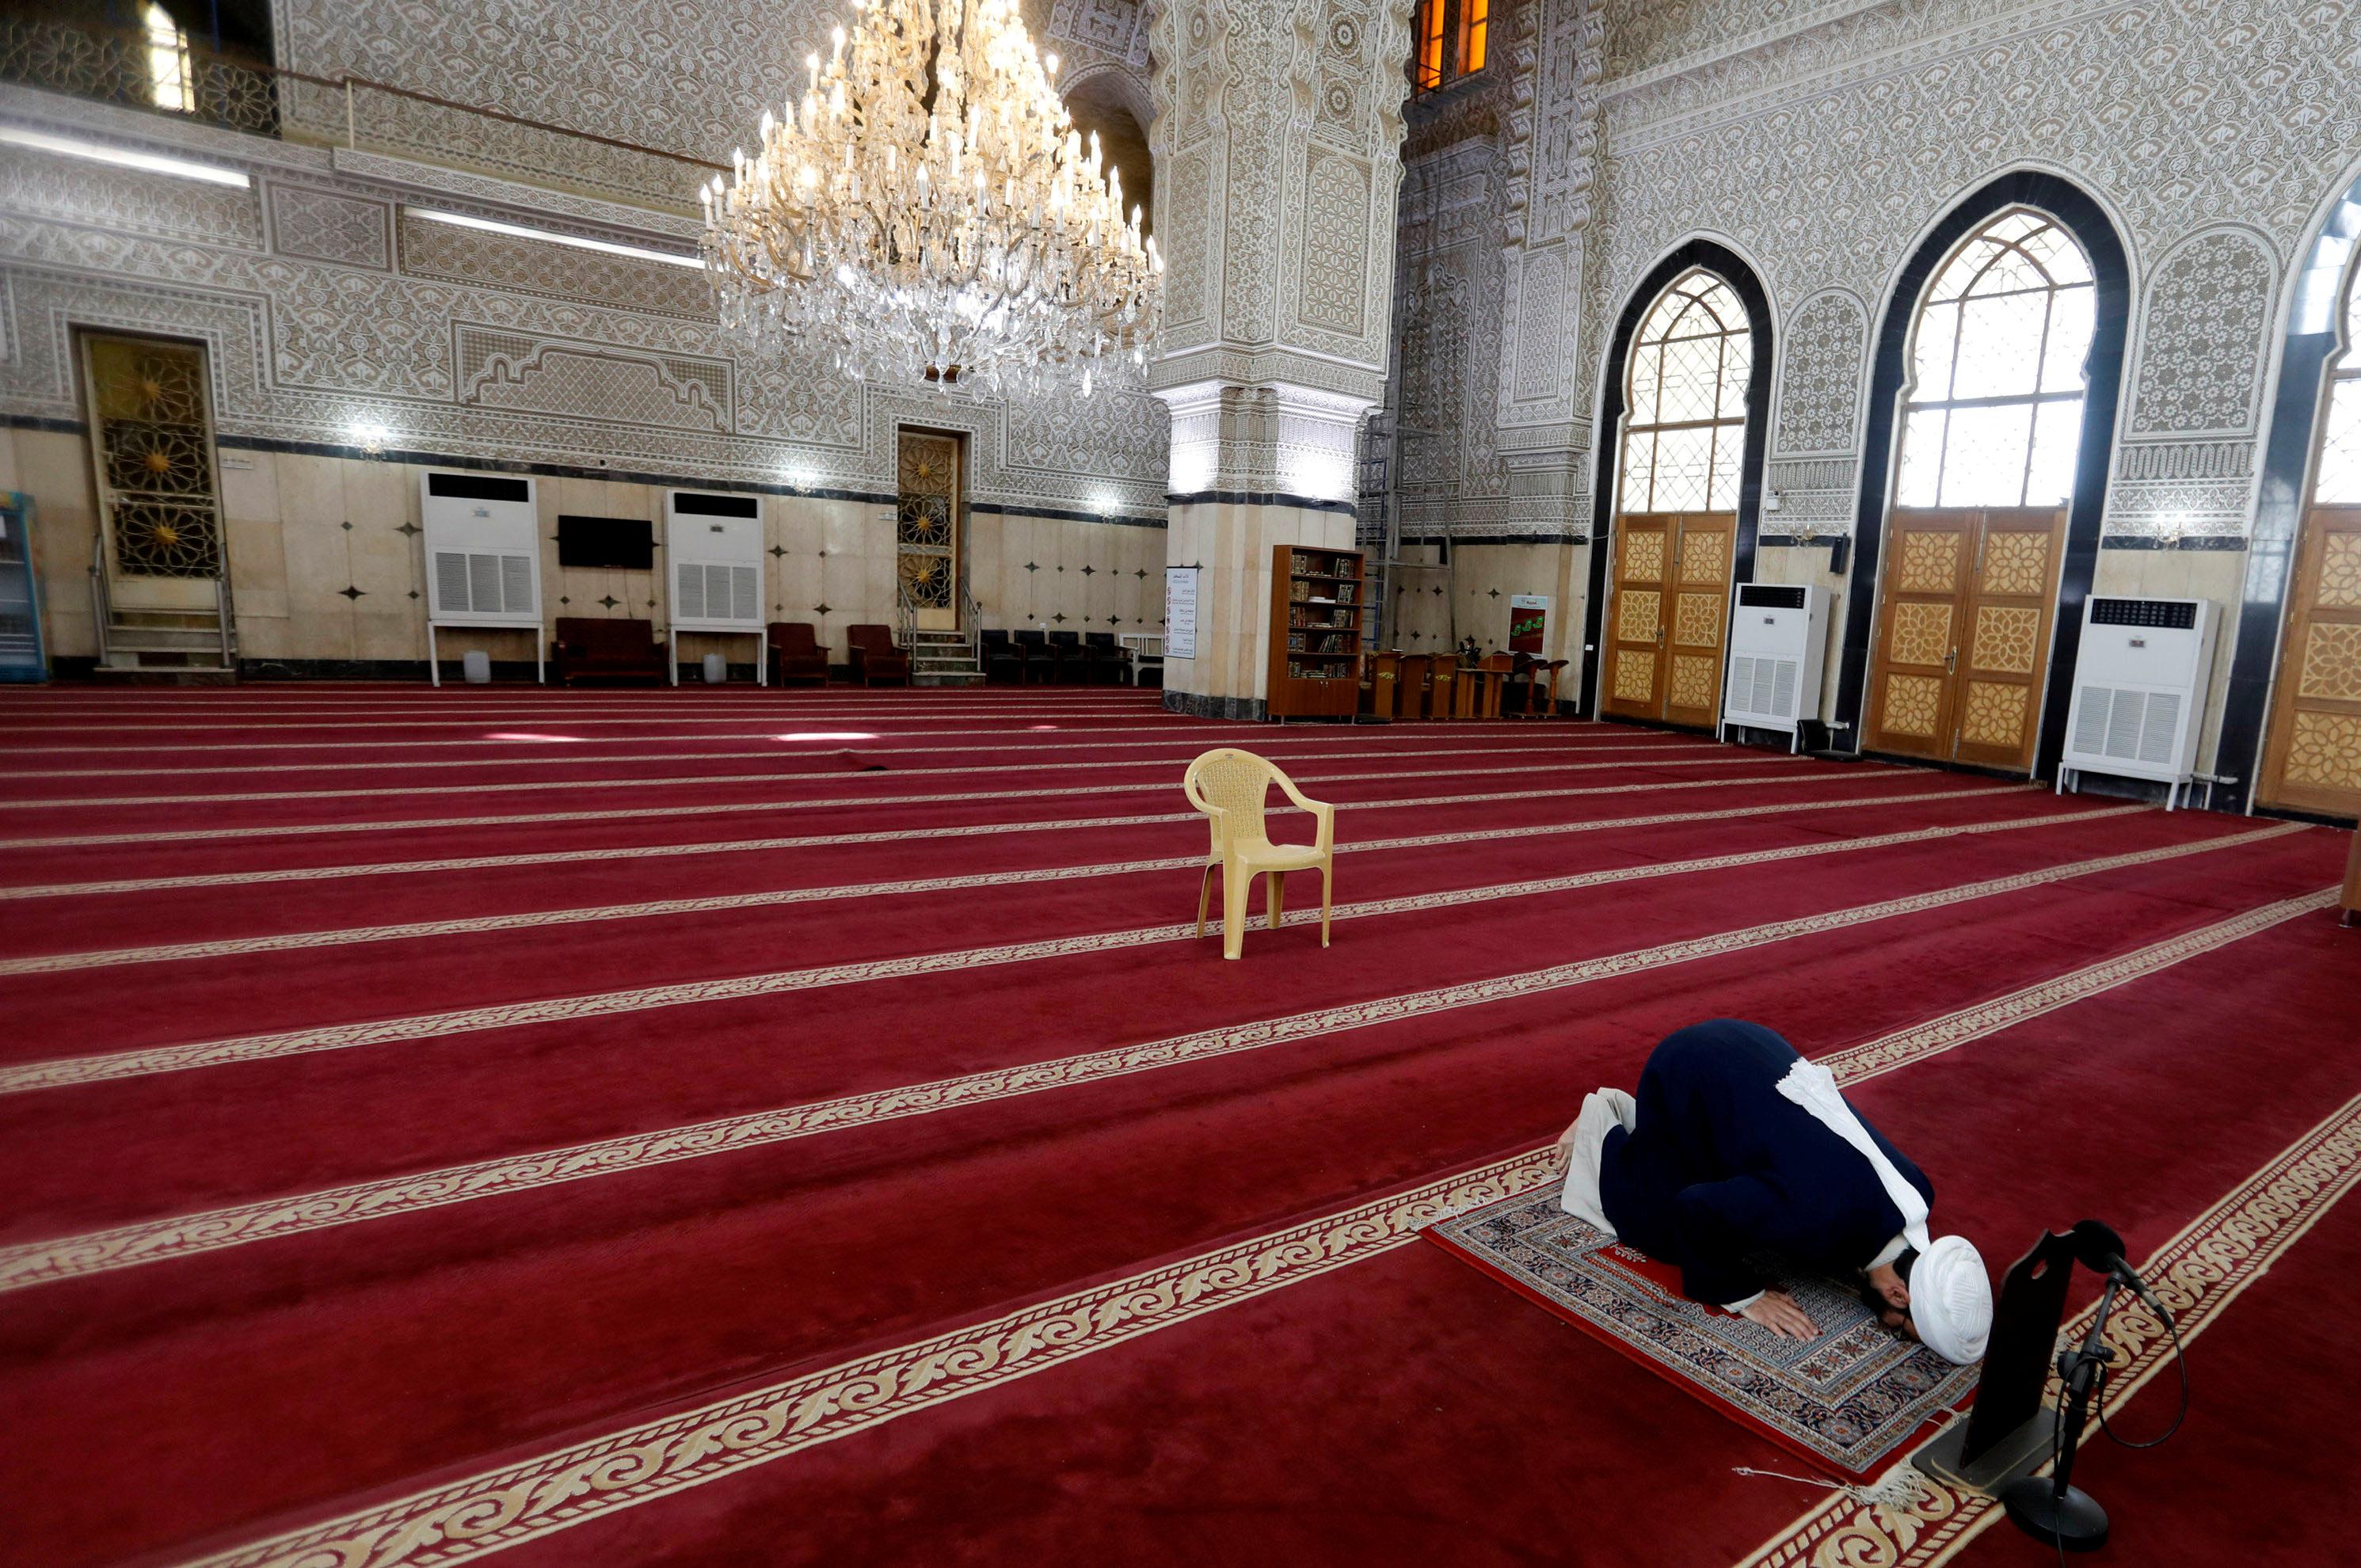 mosquesgearupforfridayprayerstoday